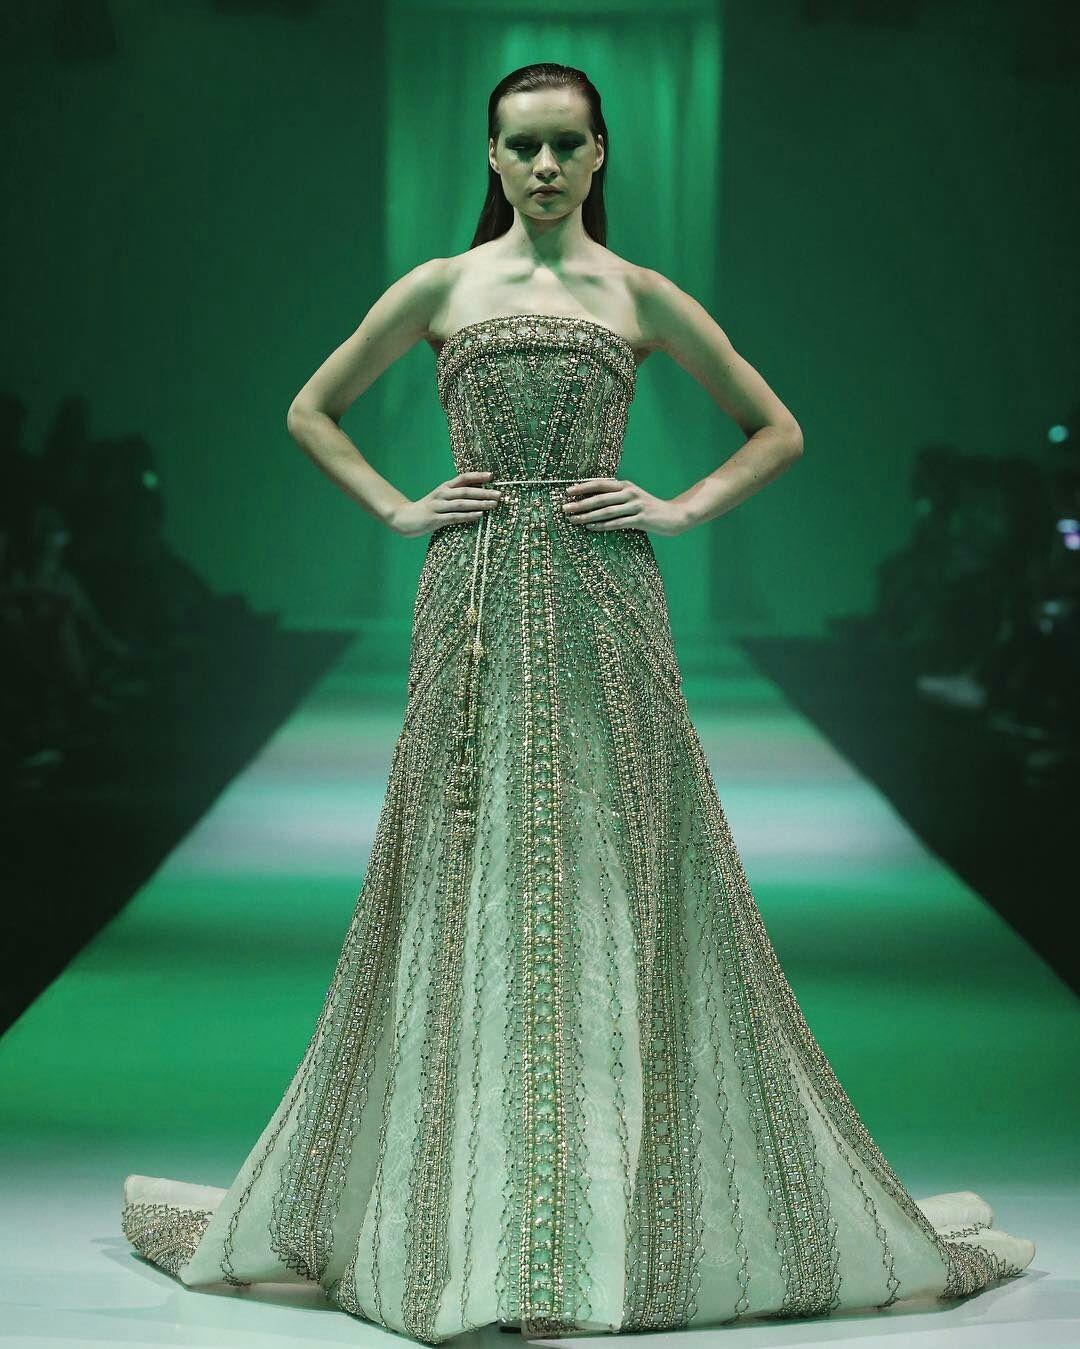 Custom Wedding Dresses Ball Gowns Mother Of Bride Evening Wear Ball Gowns Couture Evening Dress Evening Wear Dresses